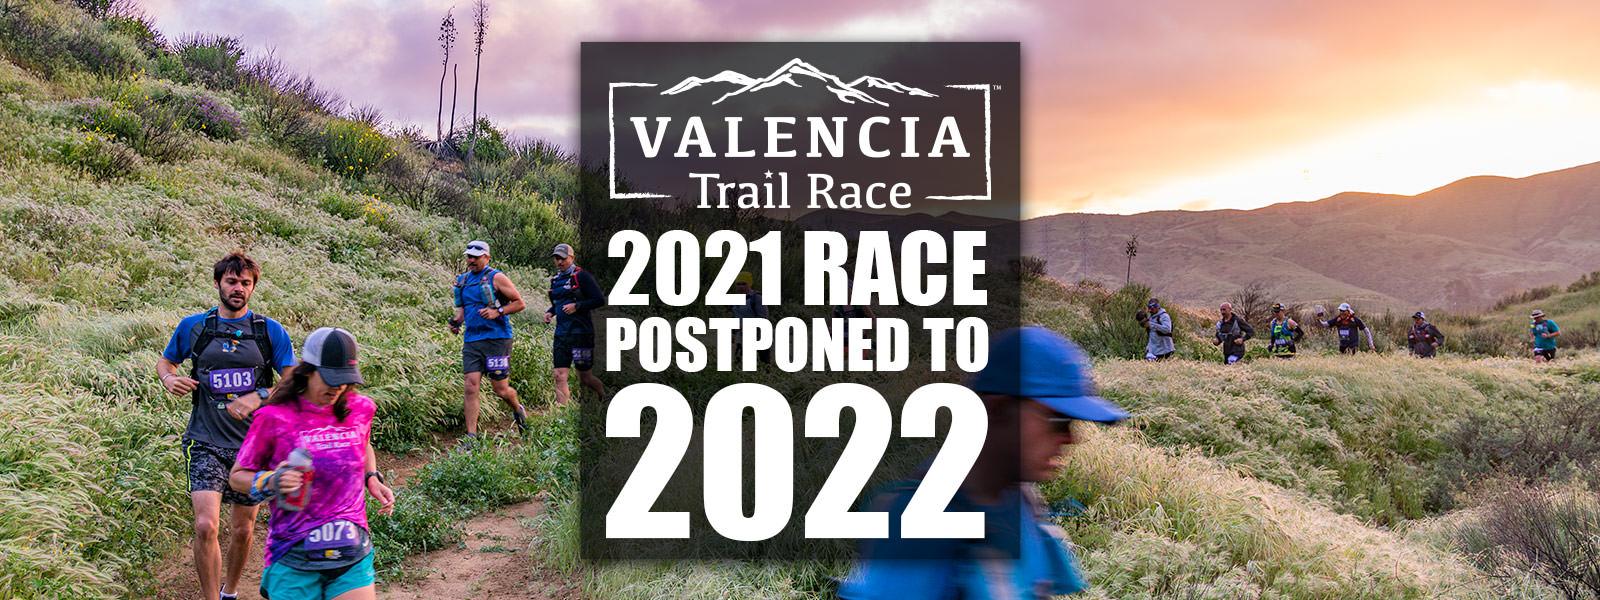 Race Postponed to 2022